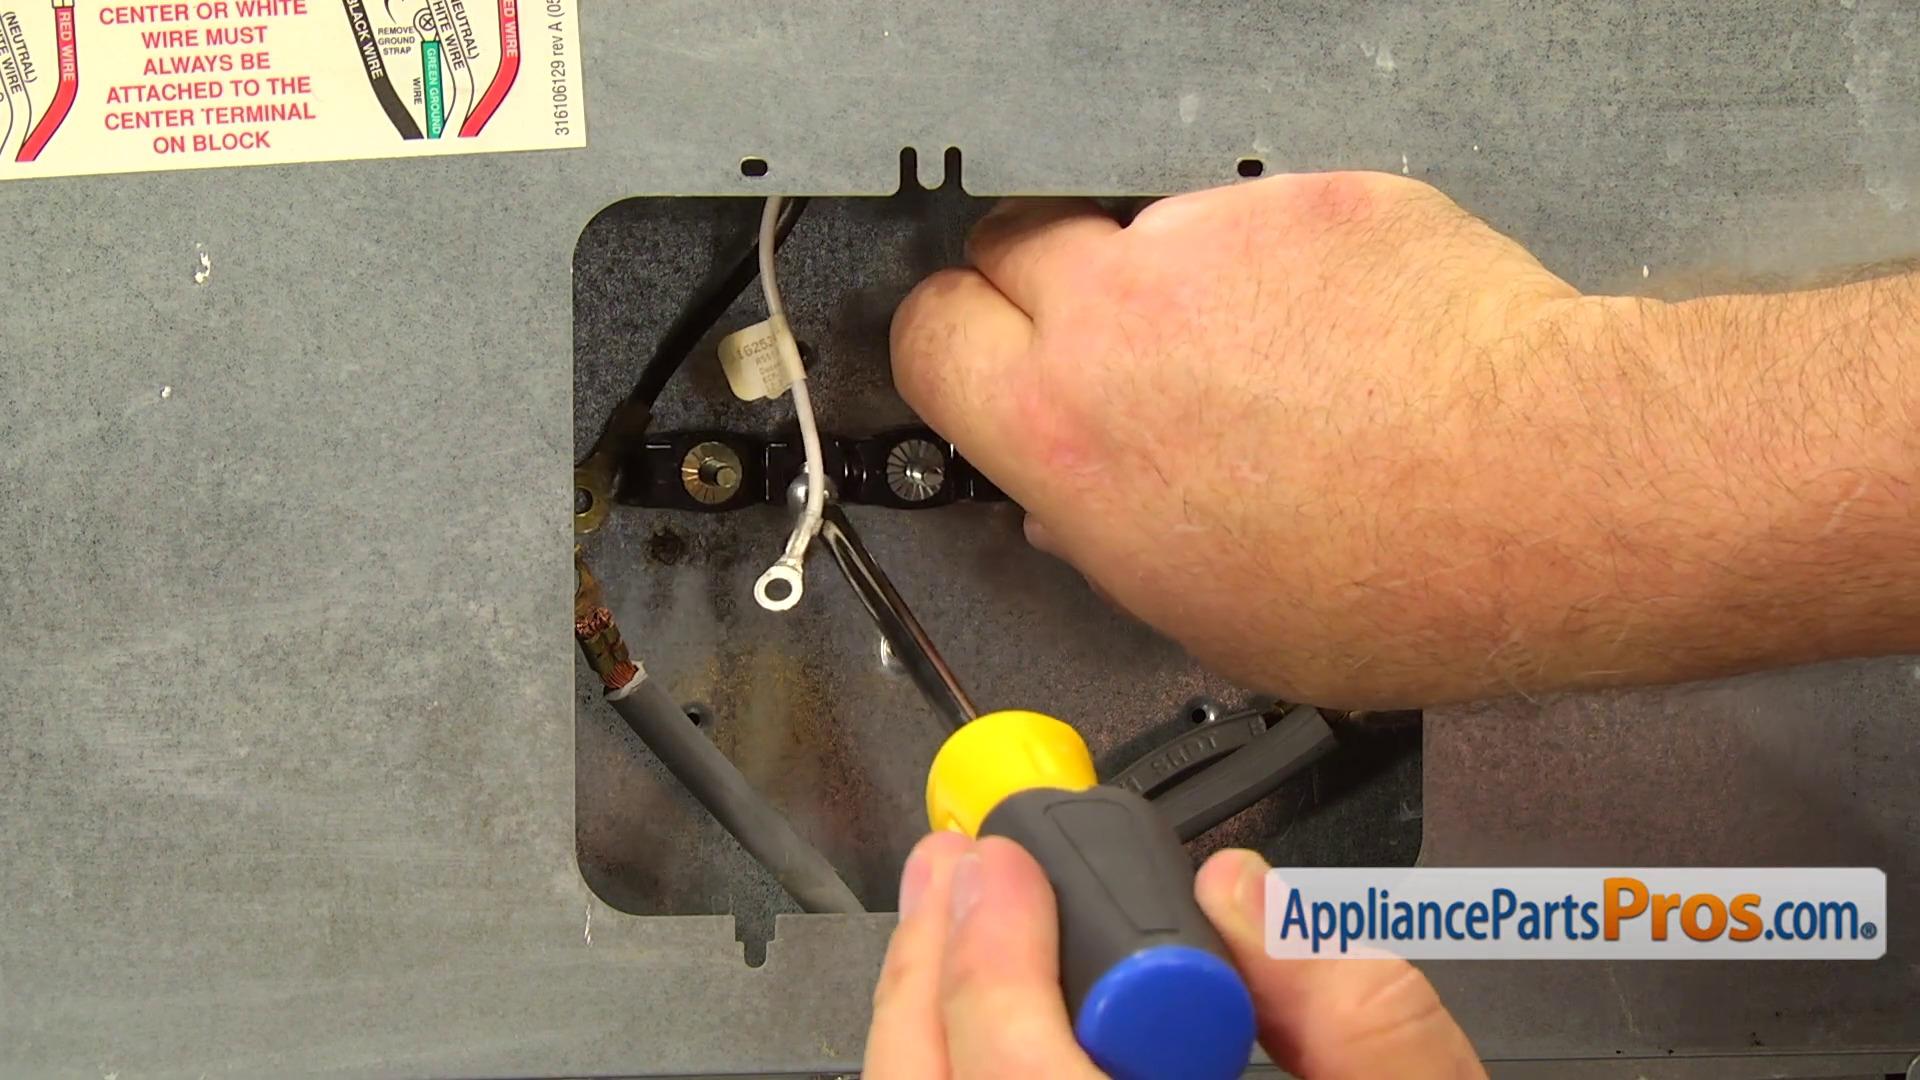 Parts For Frigidaire Cfes365ec6 Range 07top Drawer 09door 01cover 10wiring Diagram 11wiring